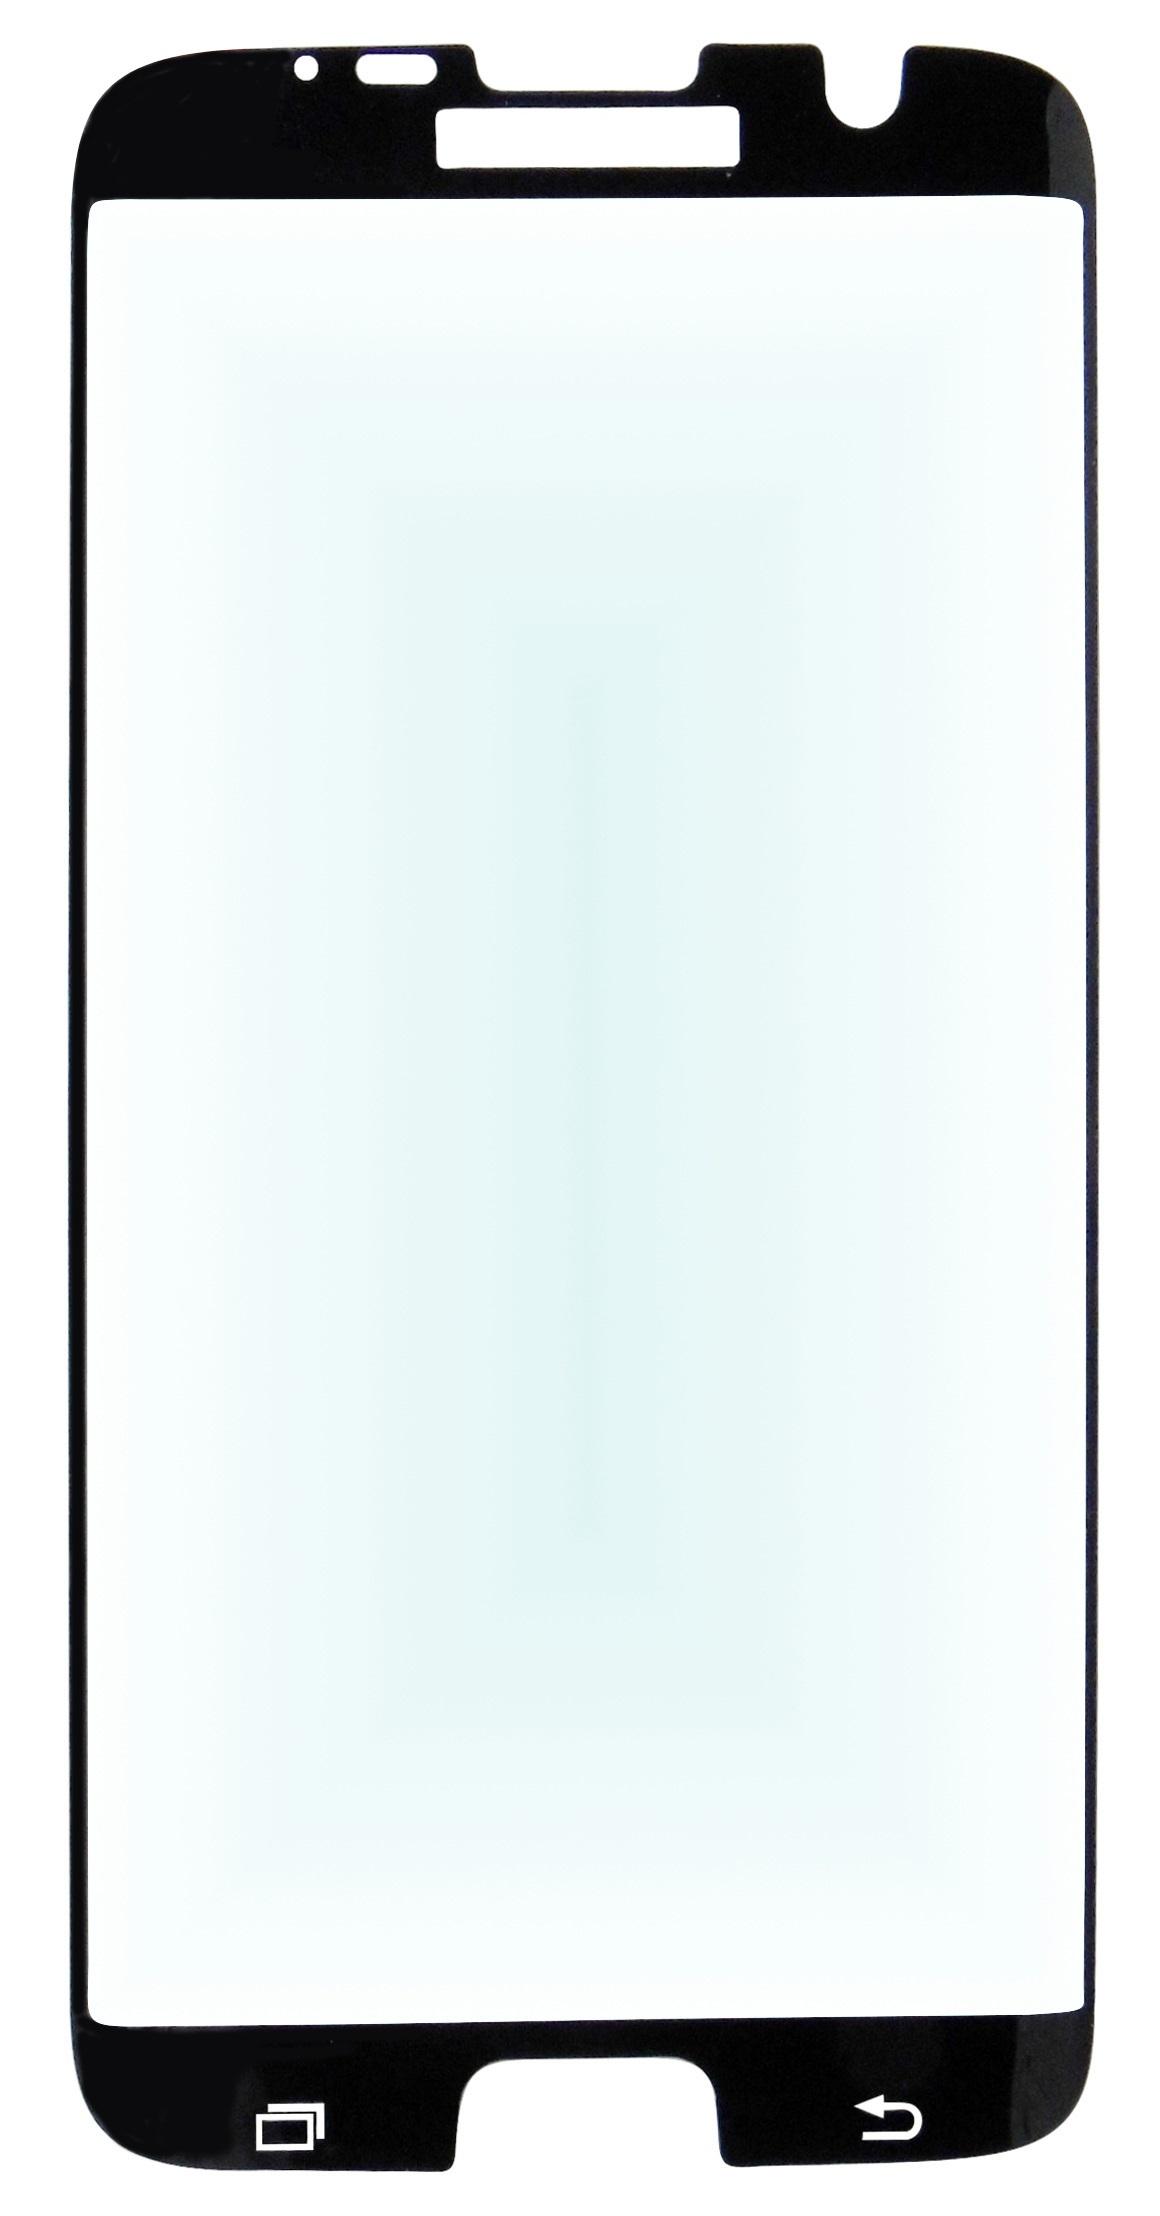 Folie sticla protectie ecran Full Glue margini negre pentru Samsung Galaxy S7 Edge G935